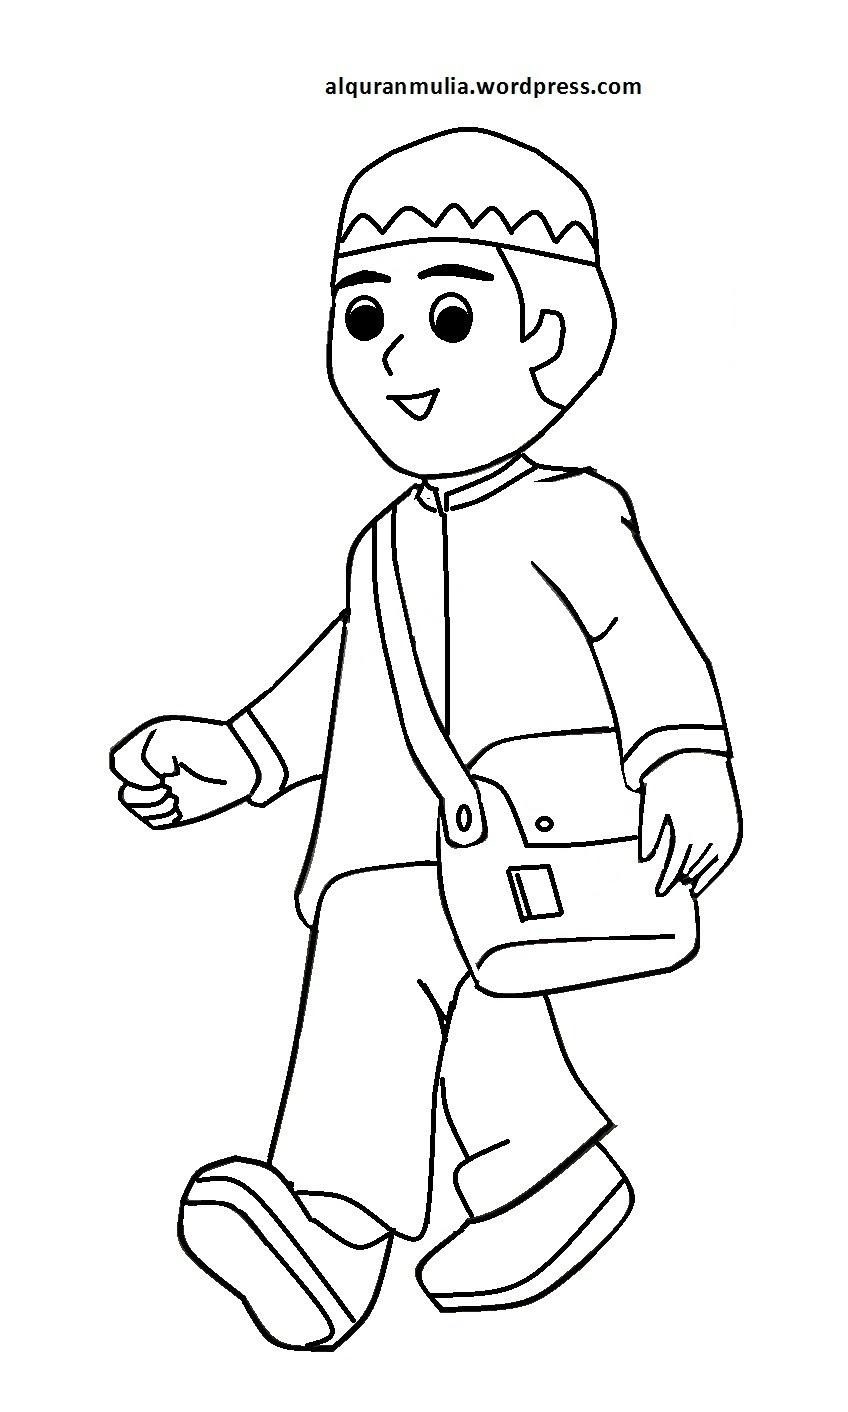 Mewarnai Gambar Mewarnai Gambar Sketsa Kartun Anak Muslim 35 Auto